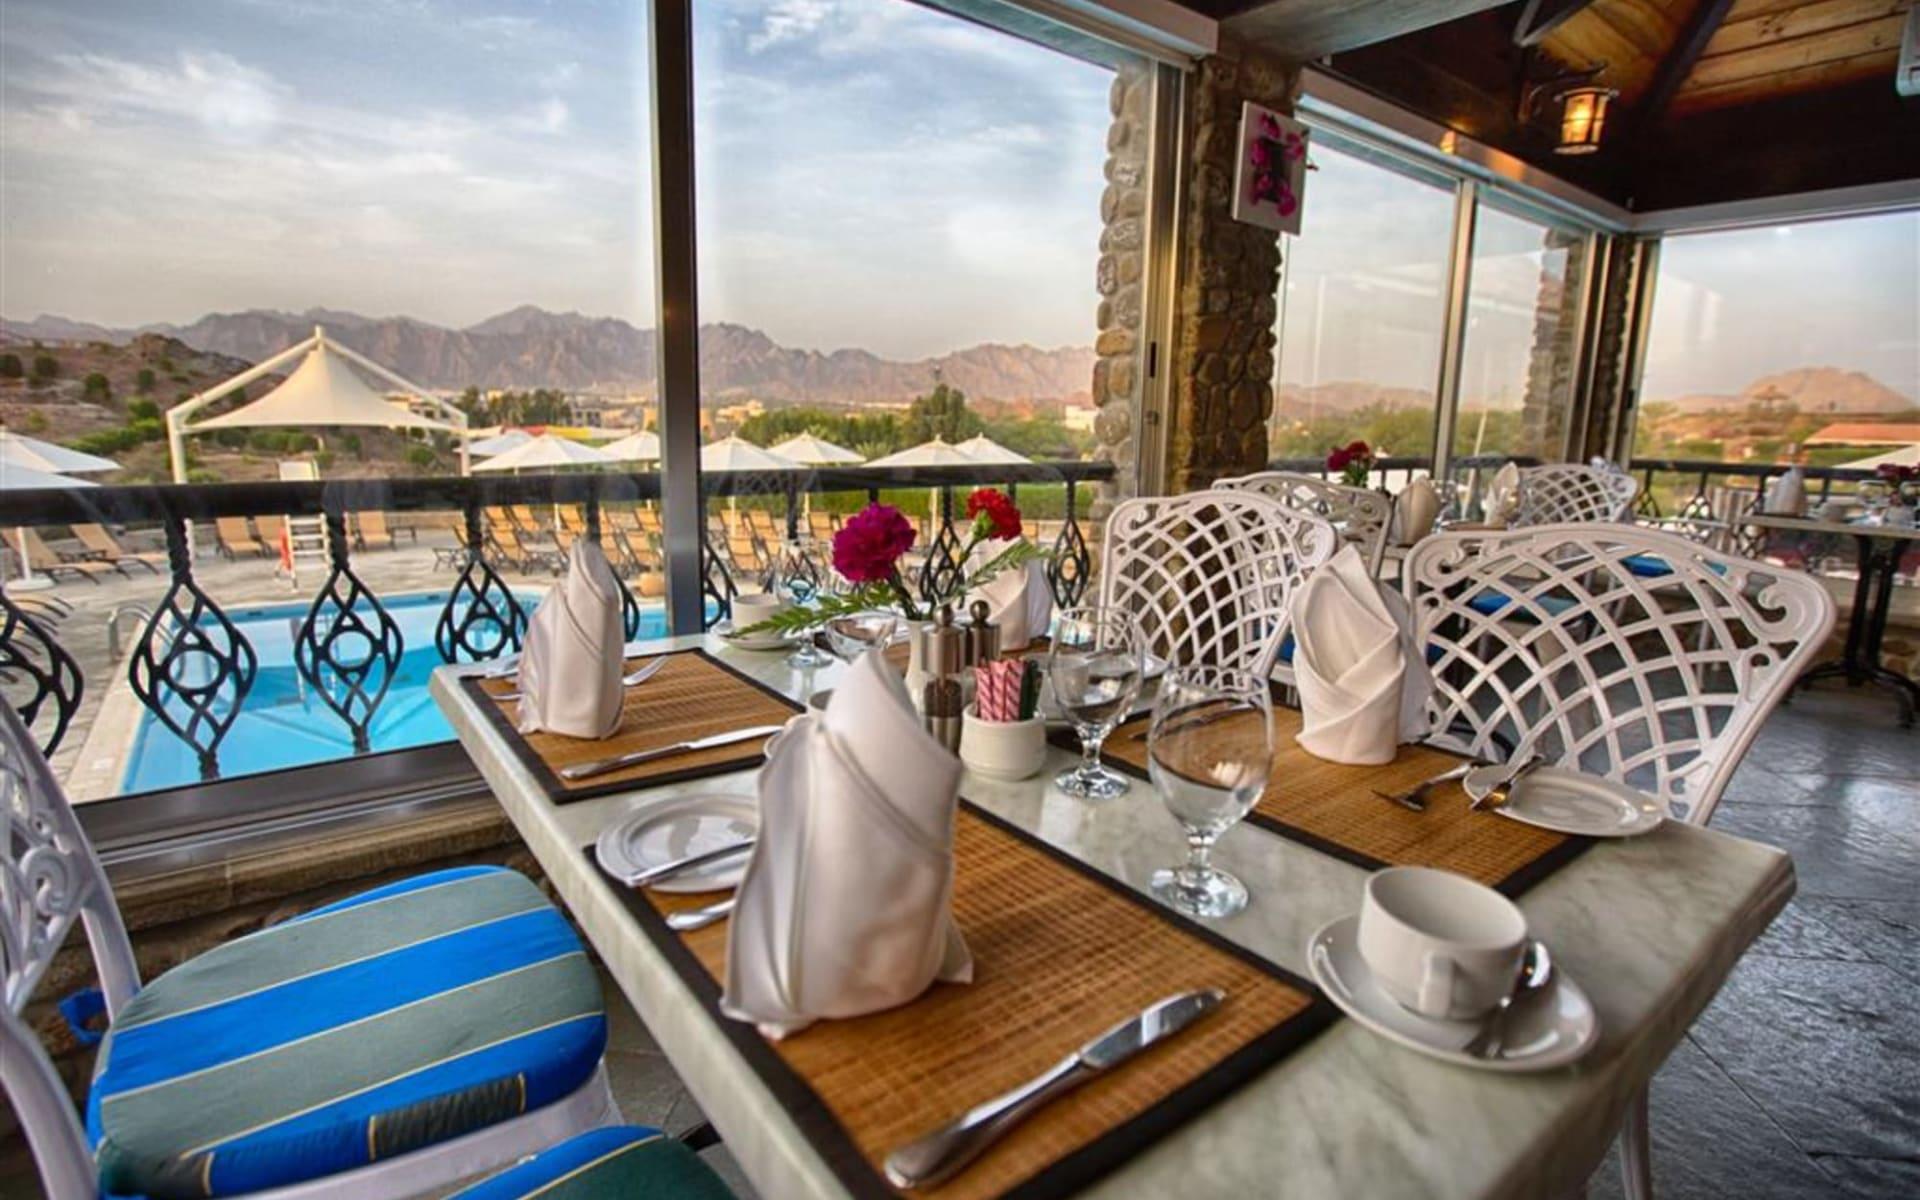 JA Hatta Fort Hotel: